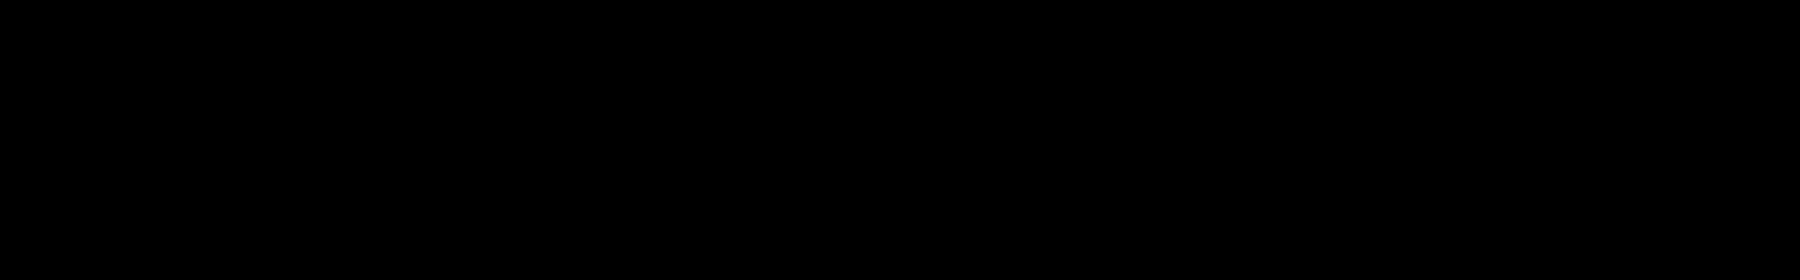 Multimedia audio waveform